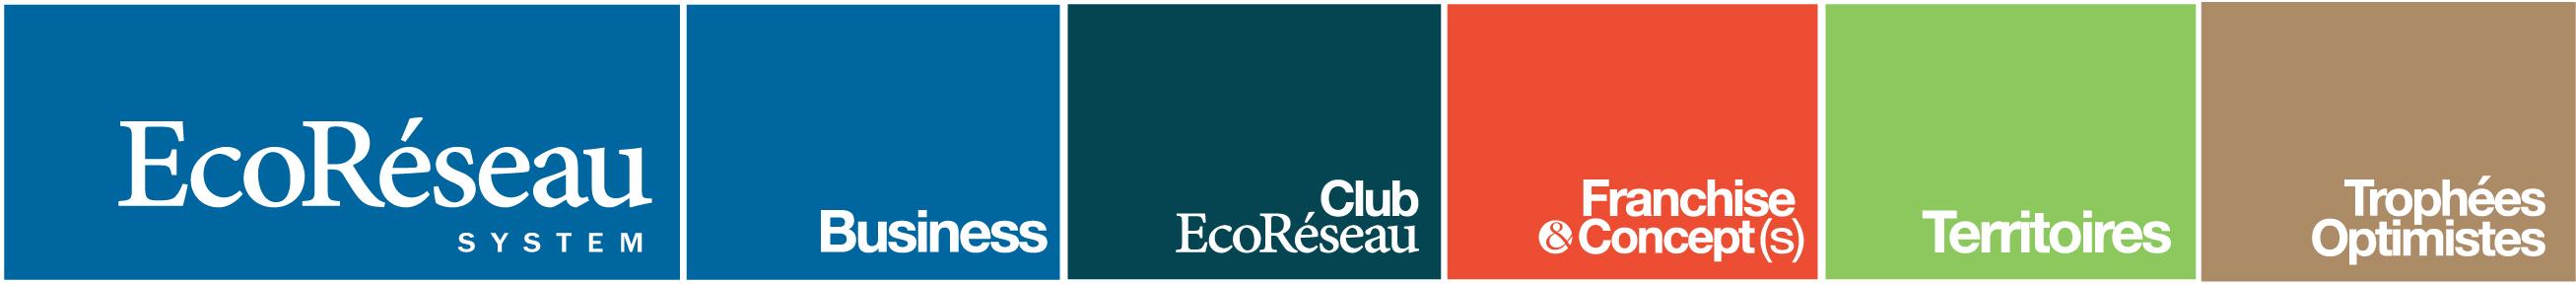 EcoRéseau System